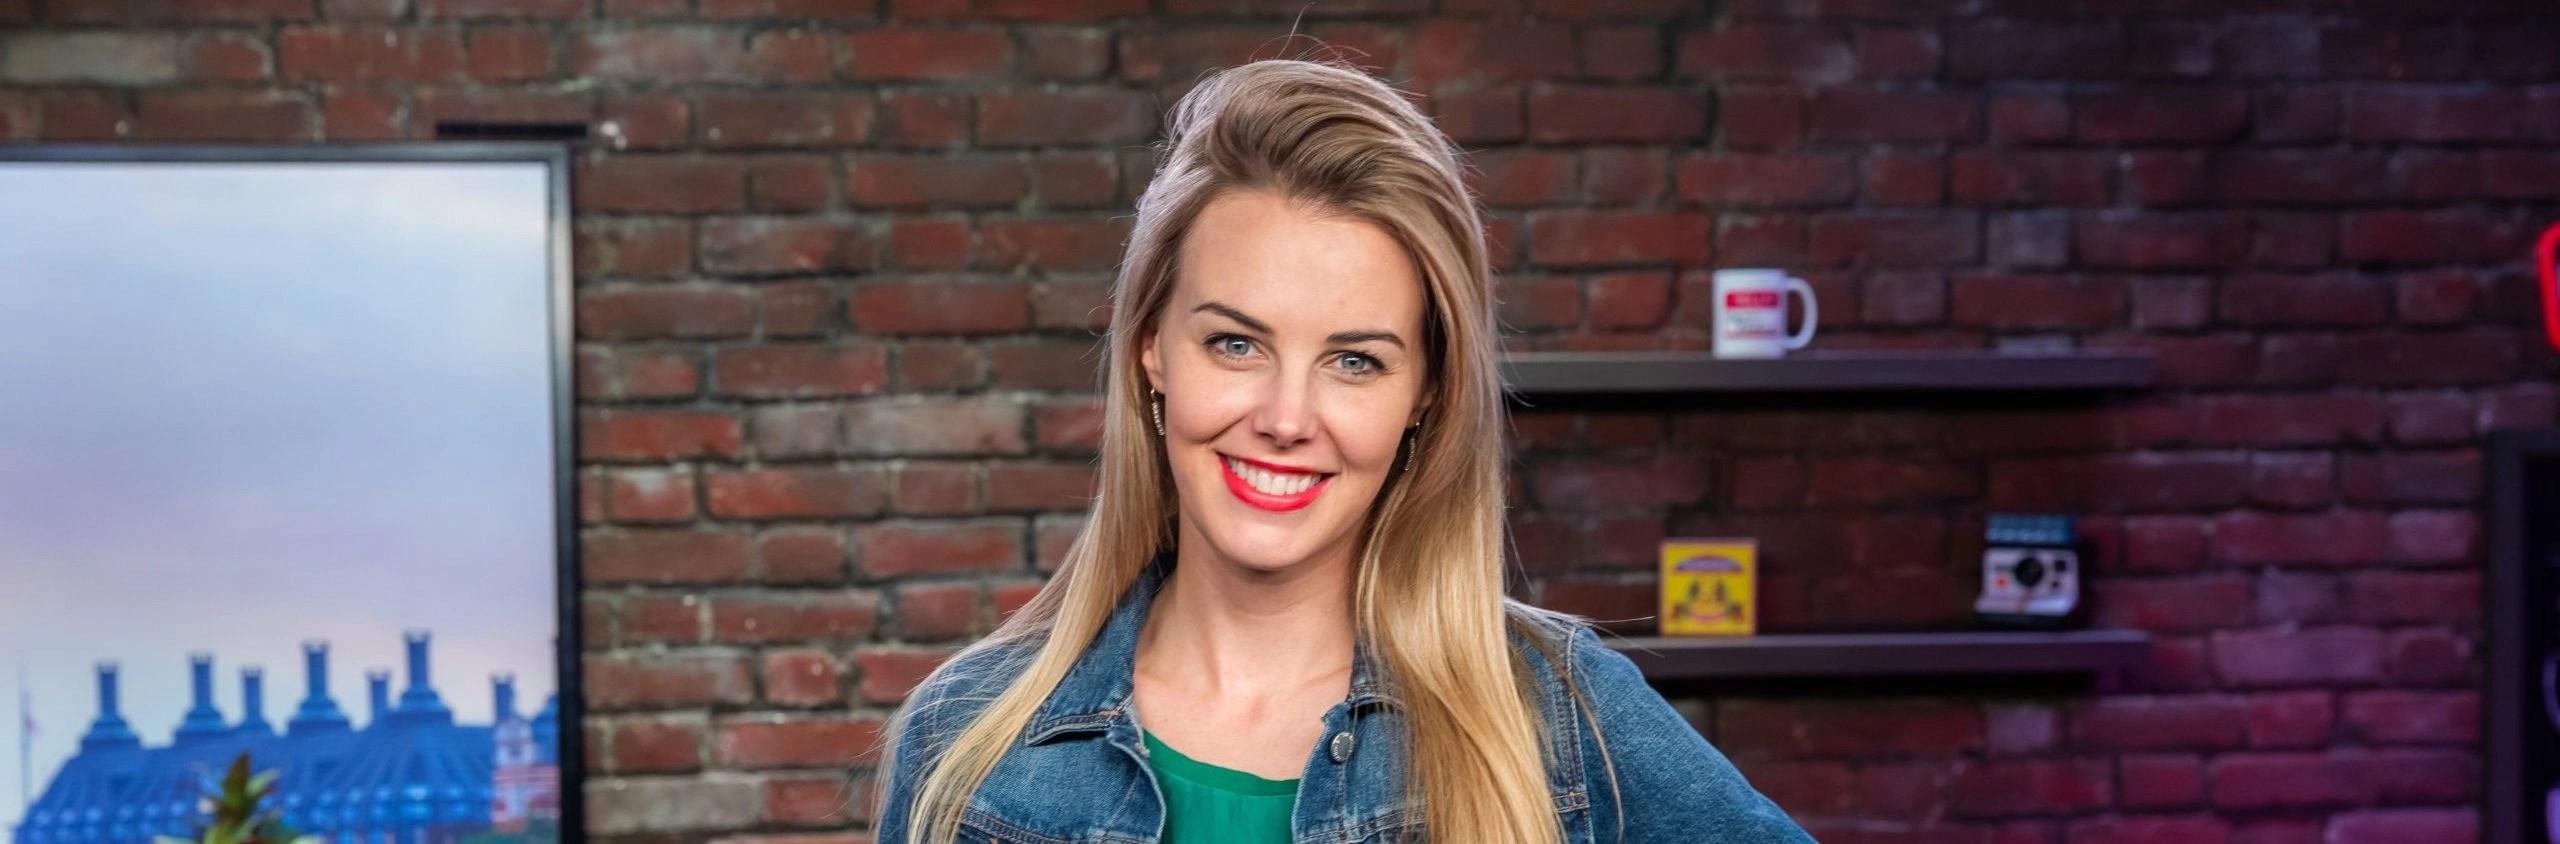 Elma Smit | Content Creator